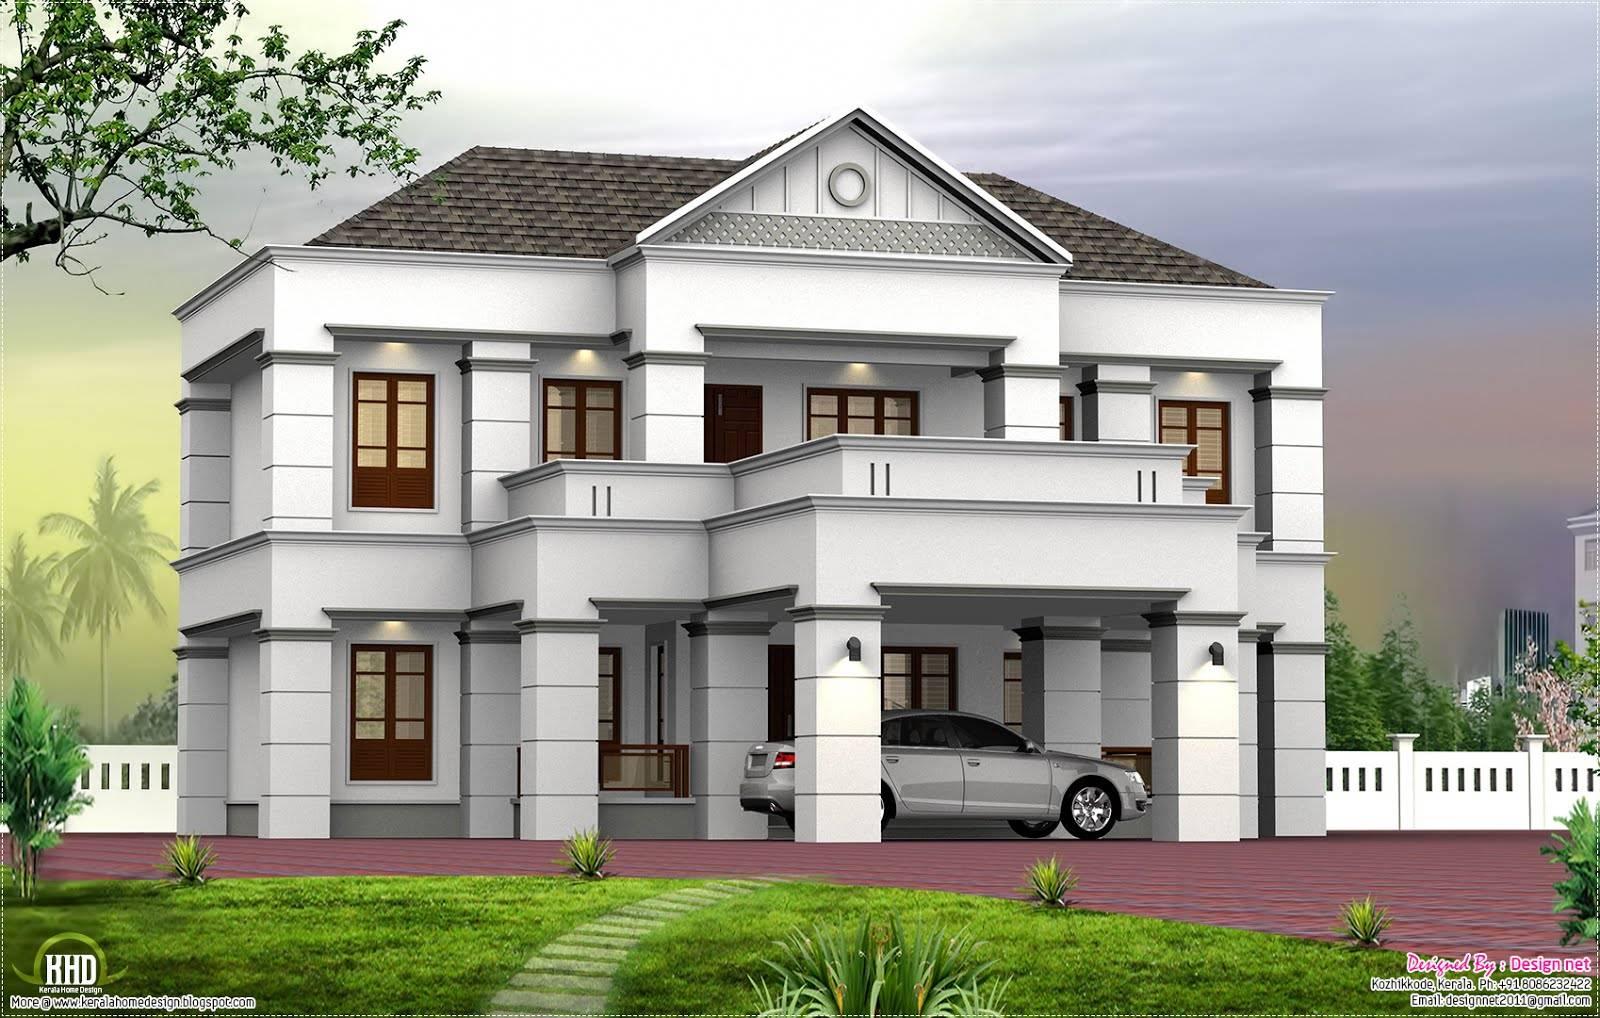 Slope Roof Box Design Kerala Home Floor Plans House Plans 15204